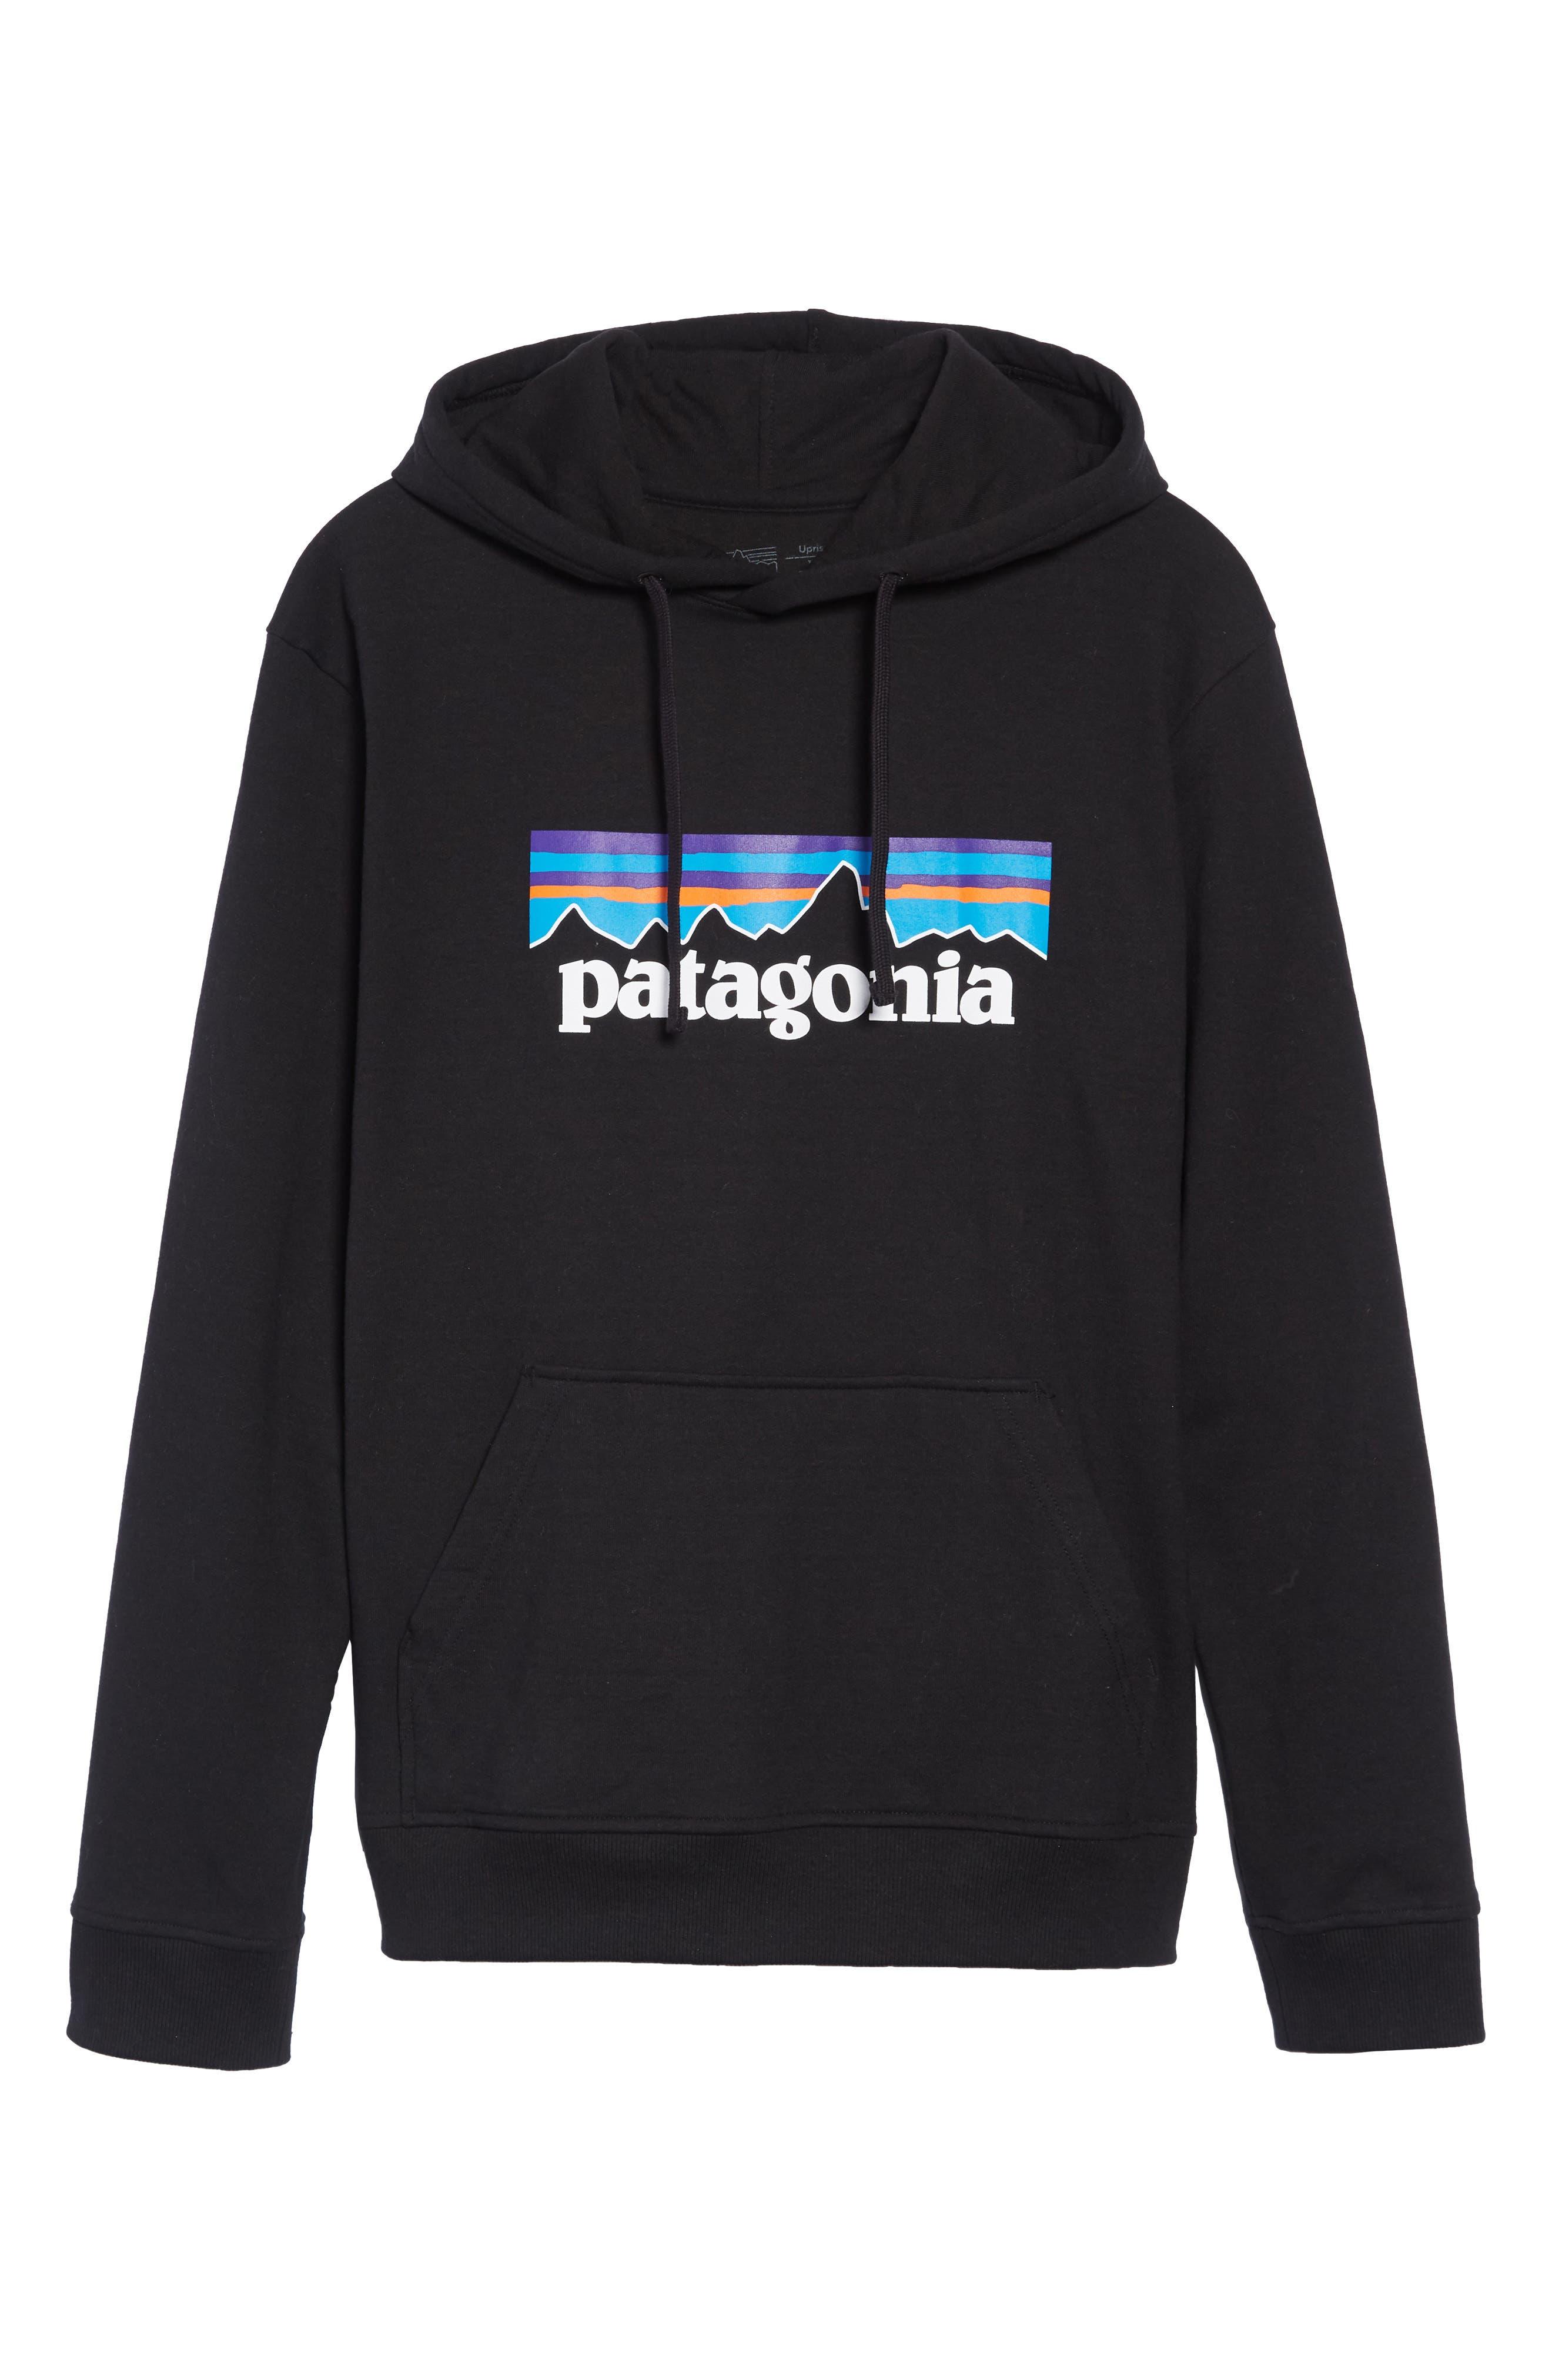 PATAGONIA, P6 Logo Uprisal Hooded Sweatshirt, Alternate thumbnail 6, color, BLACK